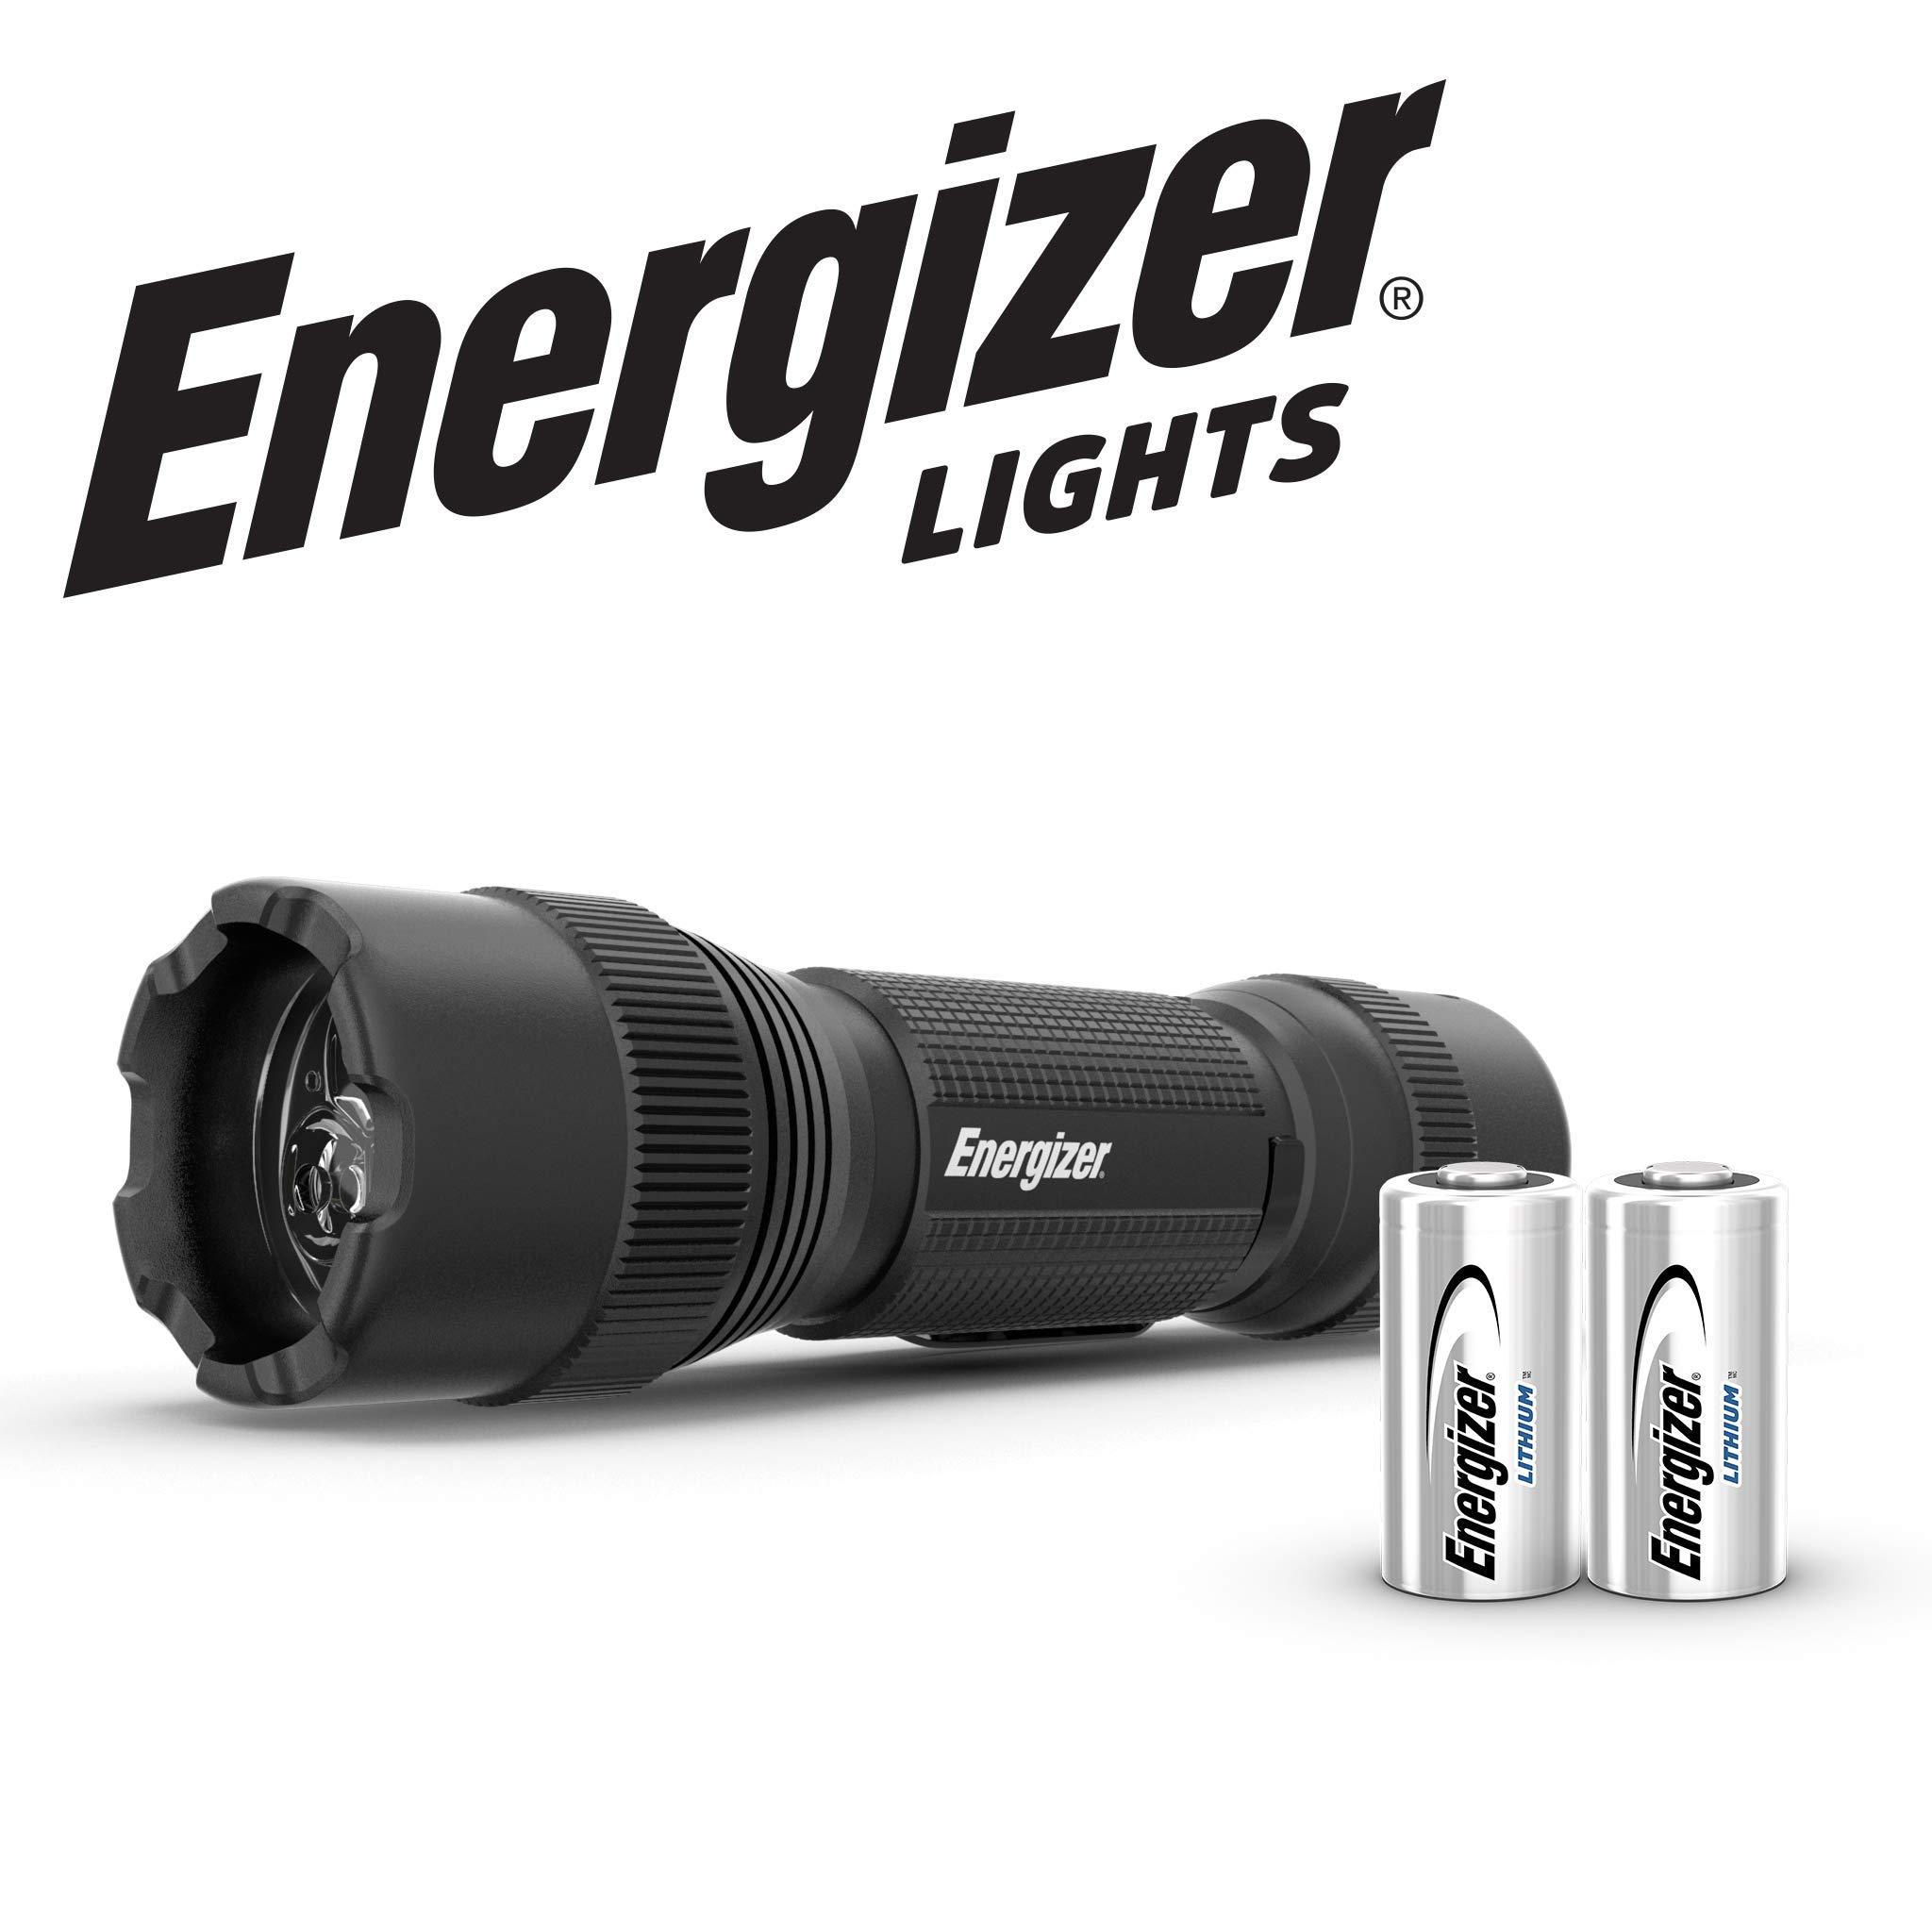 Ultra Bright 700 High Lumens Flash Energizer Tac700 Tactical LED Flashlight